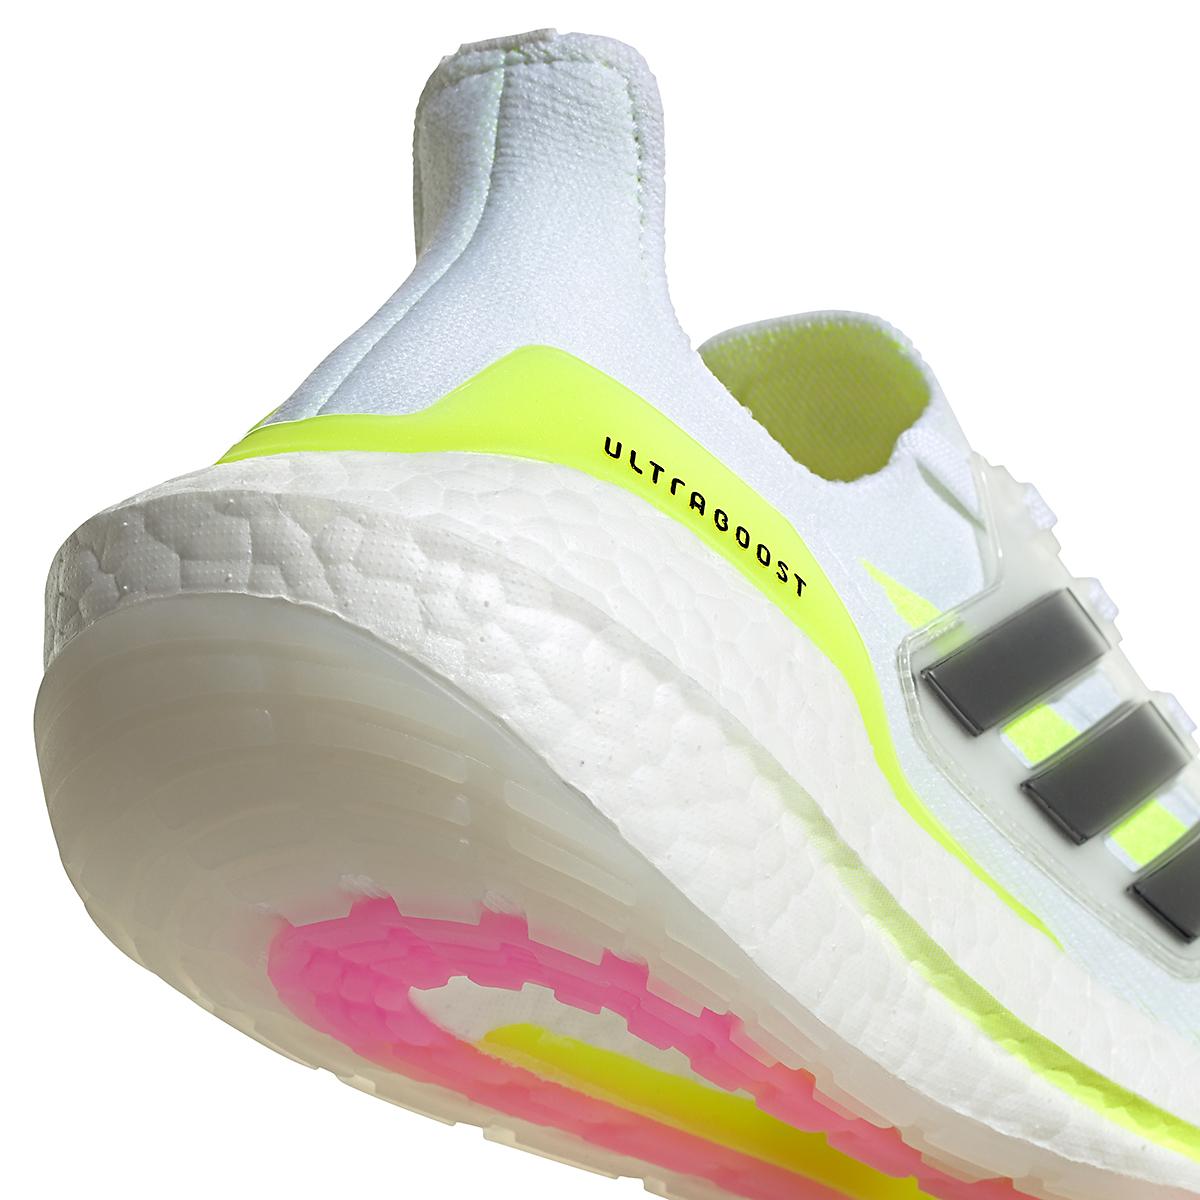 Women's Adidas Ultraboost 21 Running Shoe - Color: Cloud White/Black/Solar Yellow - Size: 5 - Width: Regular, Cloud White/Black/Solar Yellow, large, image 3